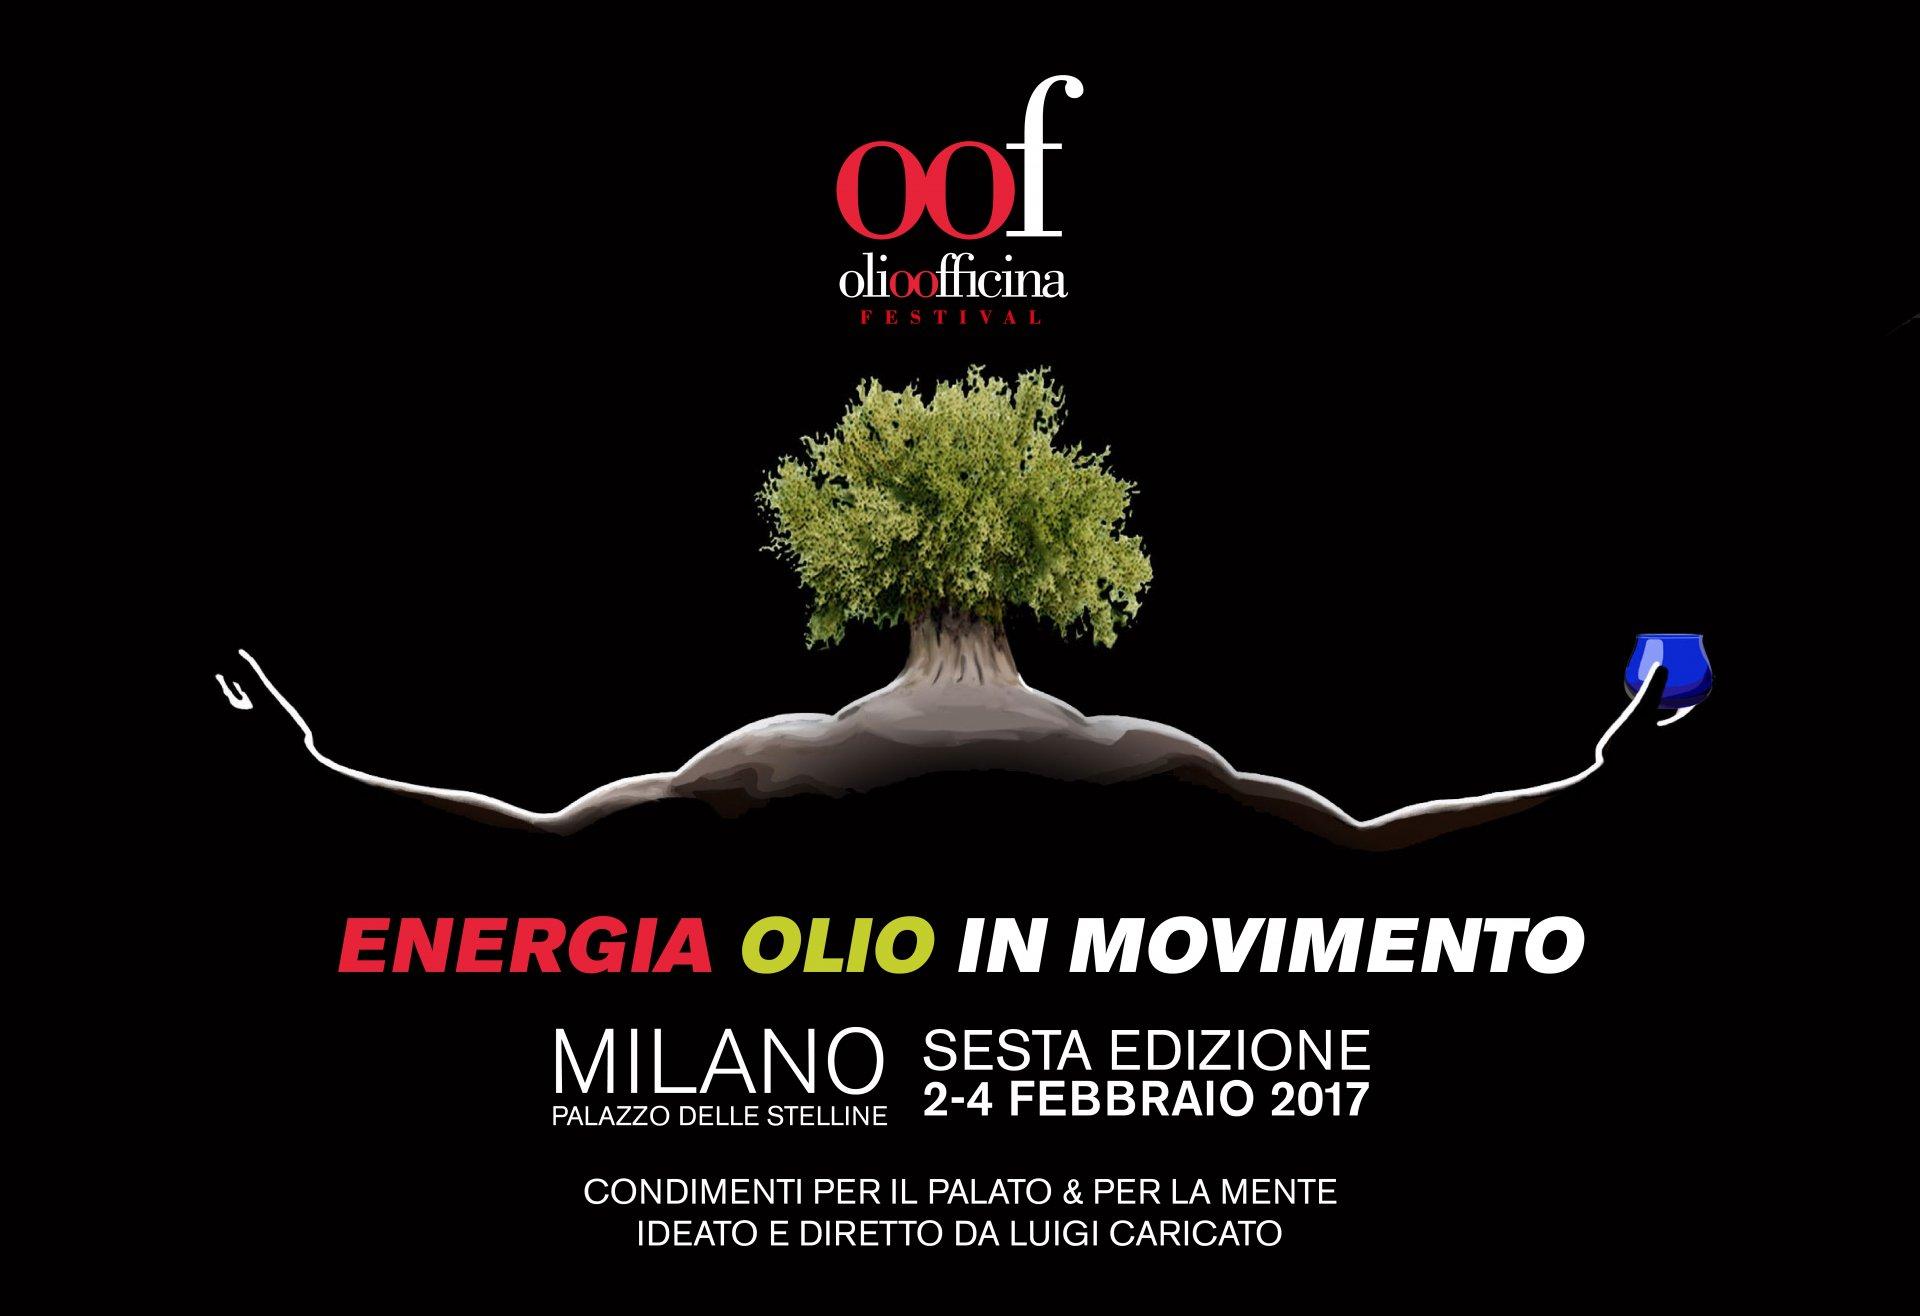 L'esordio di OOF2017